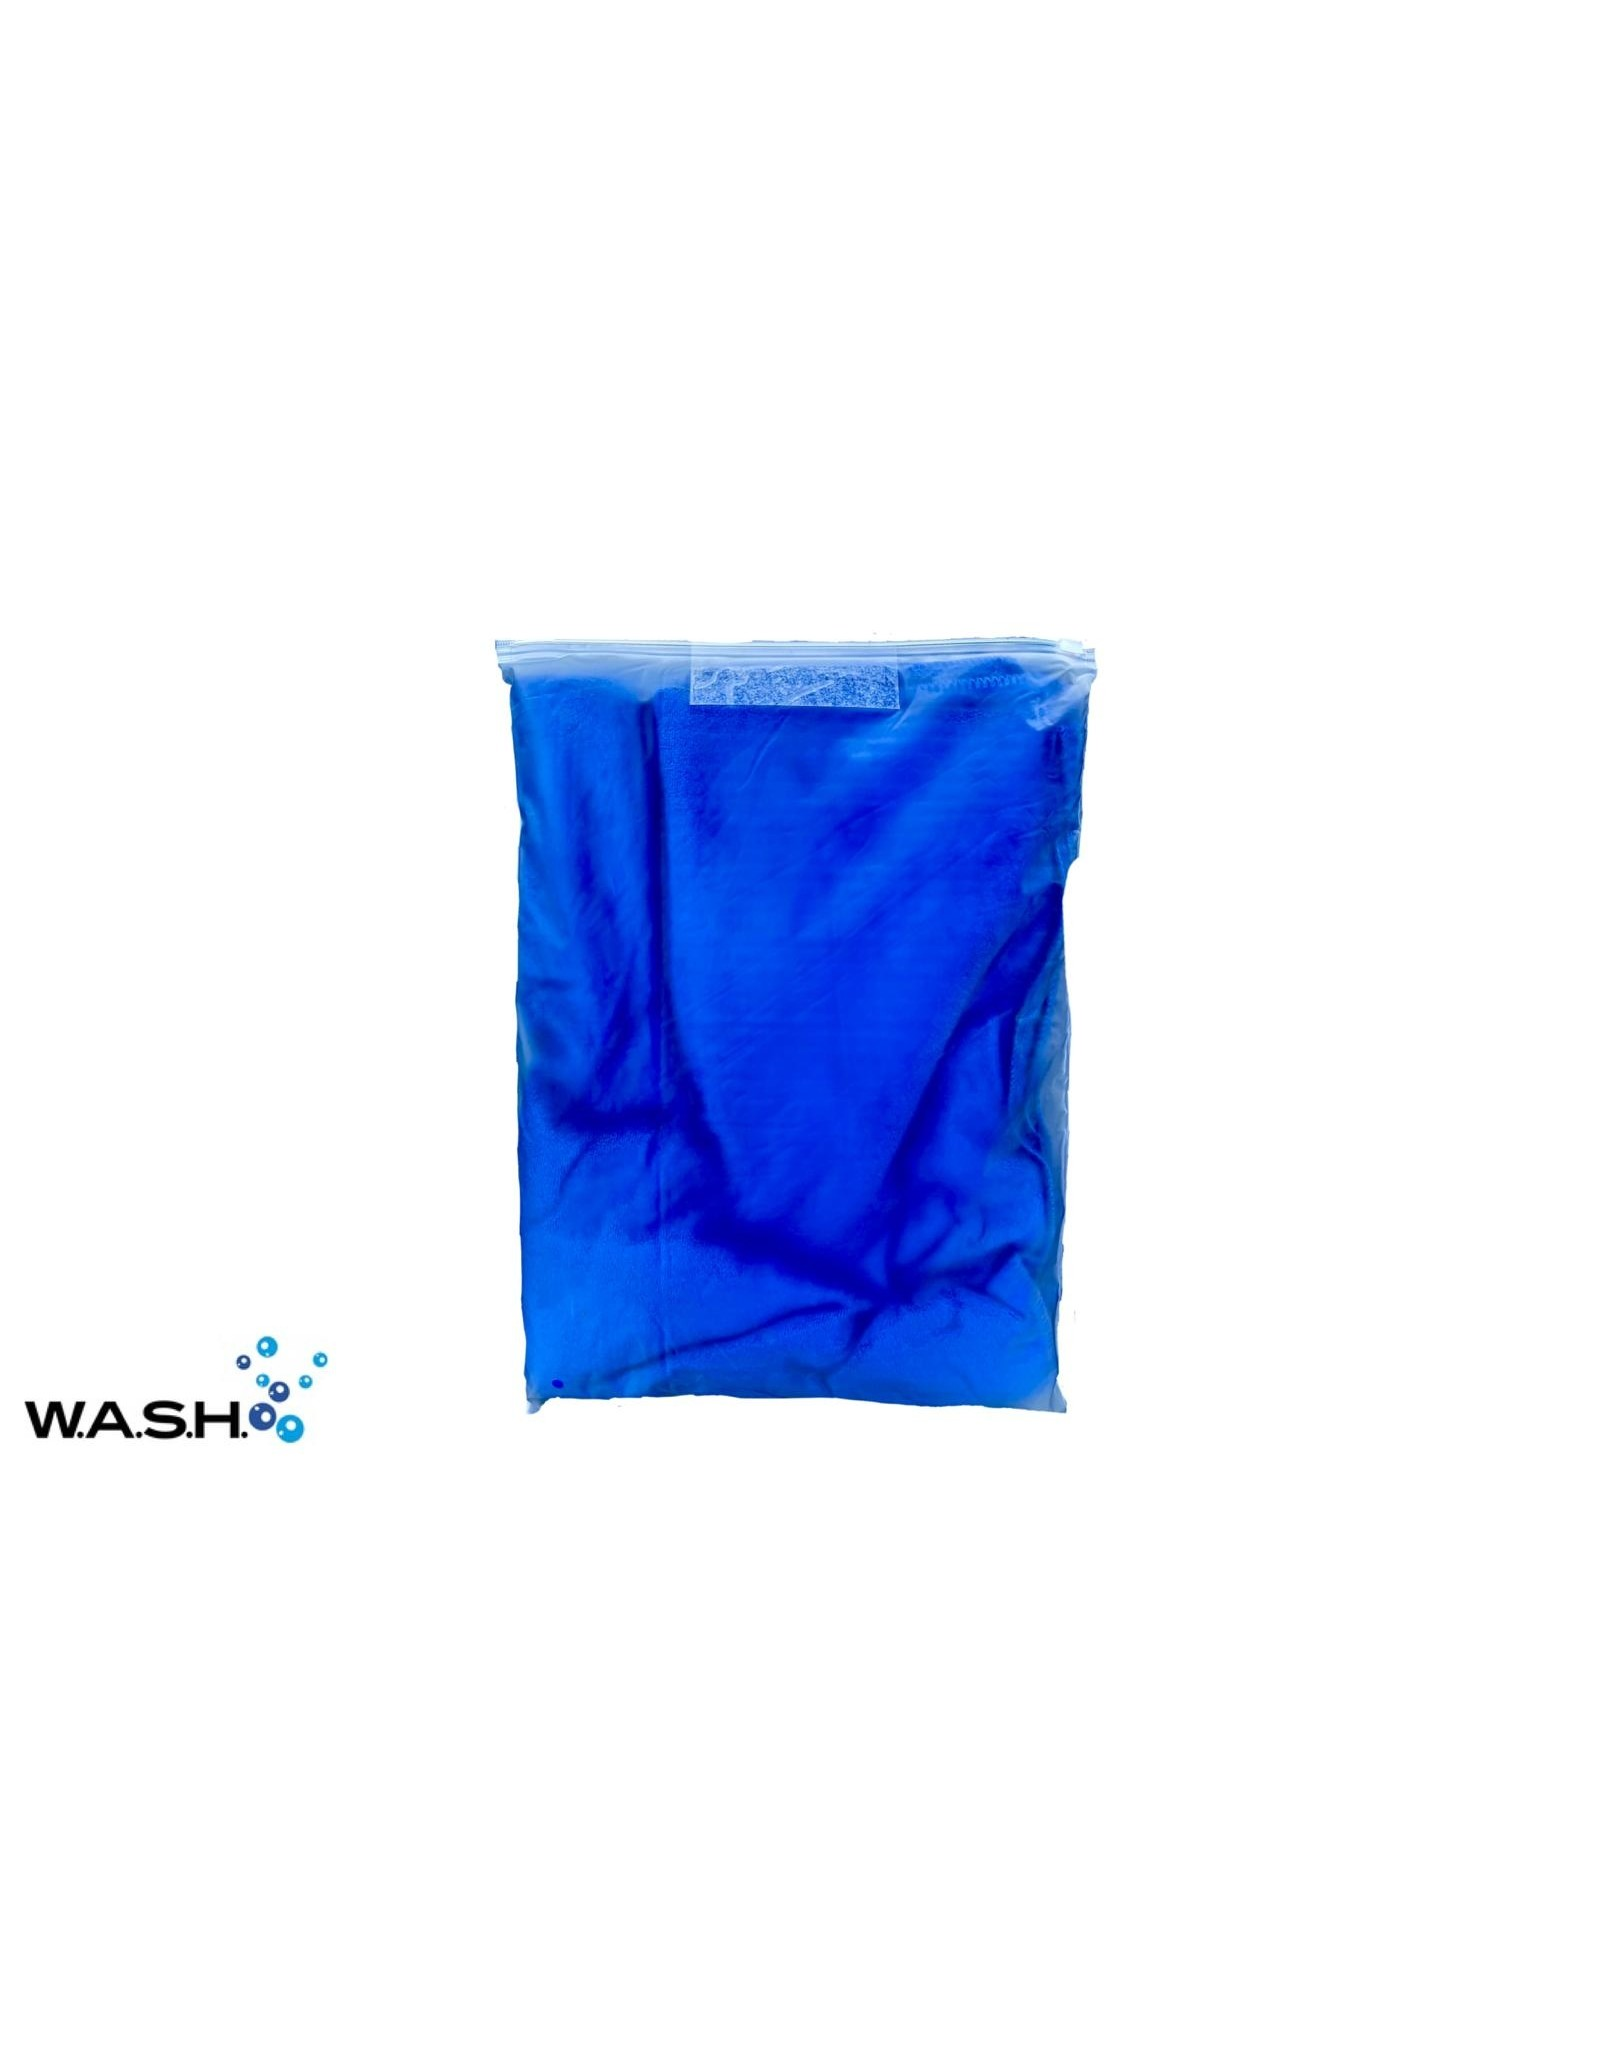 W.A.S.H. W.A.S.H. Microfiber Premium Droogdoek  Blauw - 160x60 cm